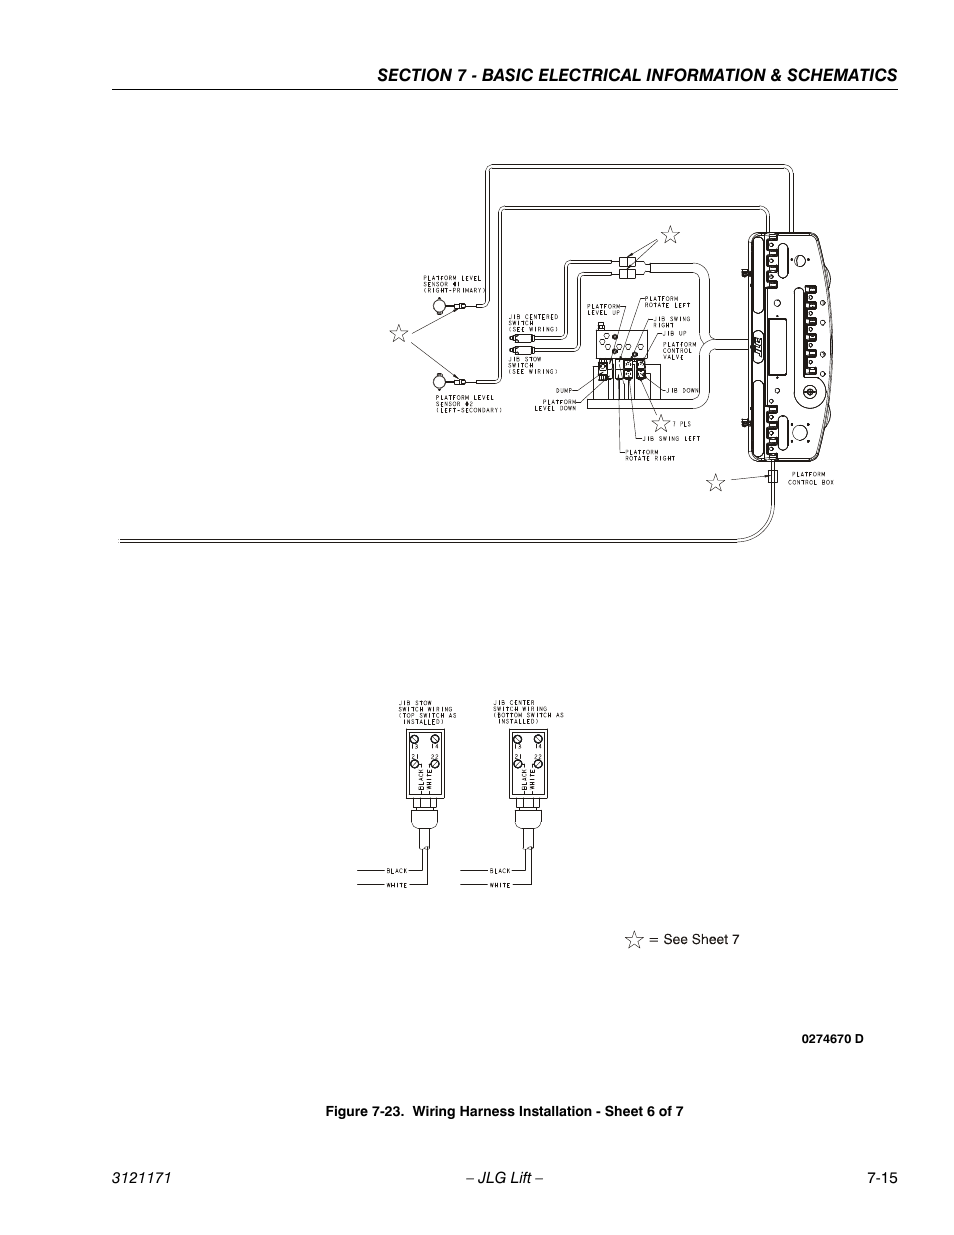 Wiring Harness Installation - Sheet 6 Of 7